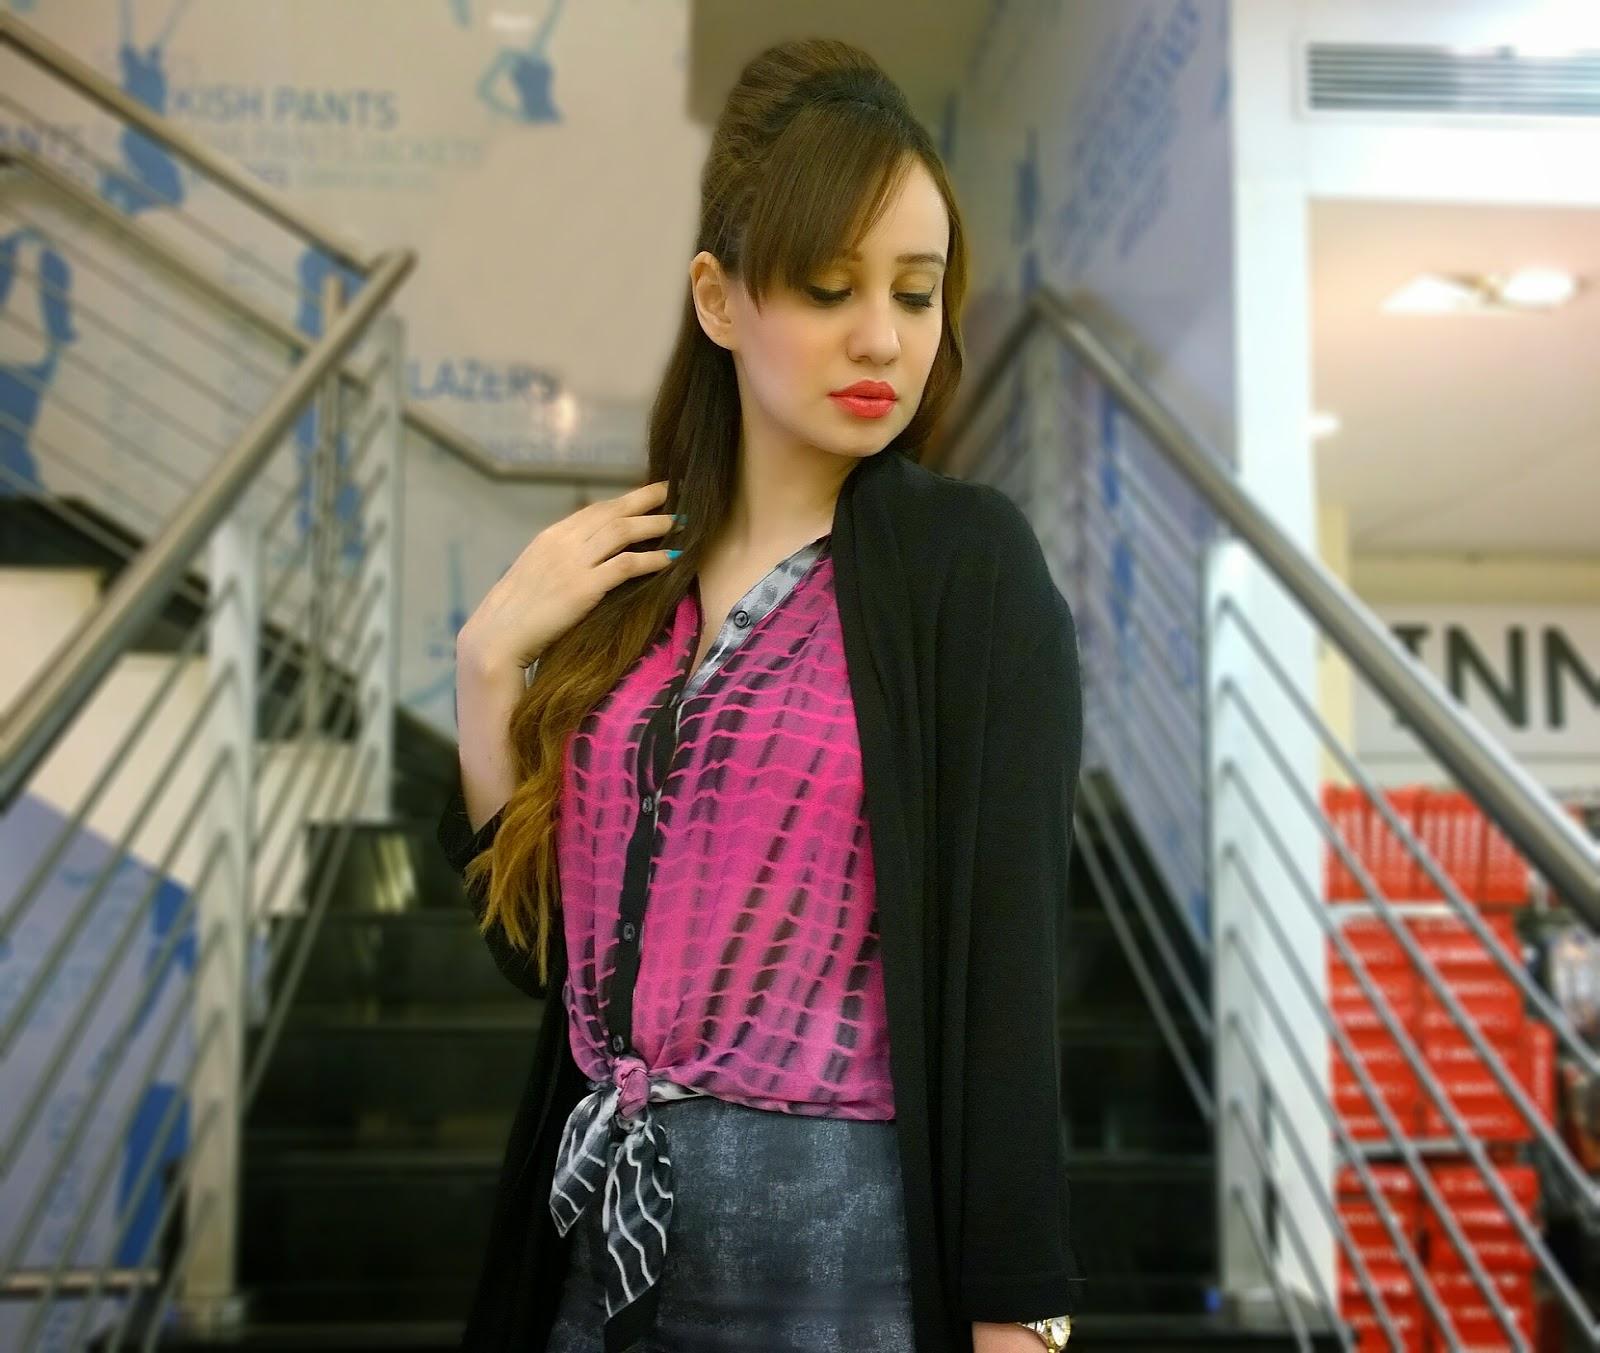 Reliance Trends Tie & Dye Shirt,Cardigan & Pencil Skirt